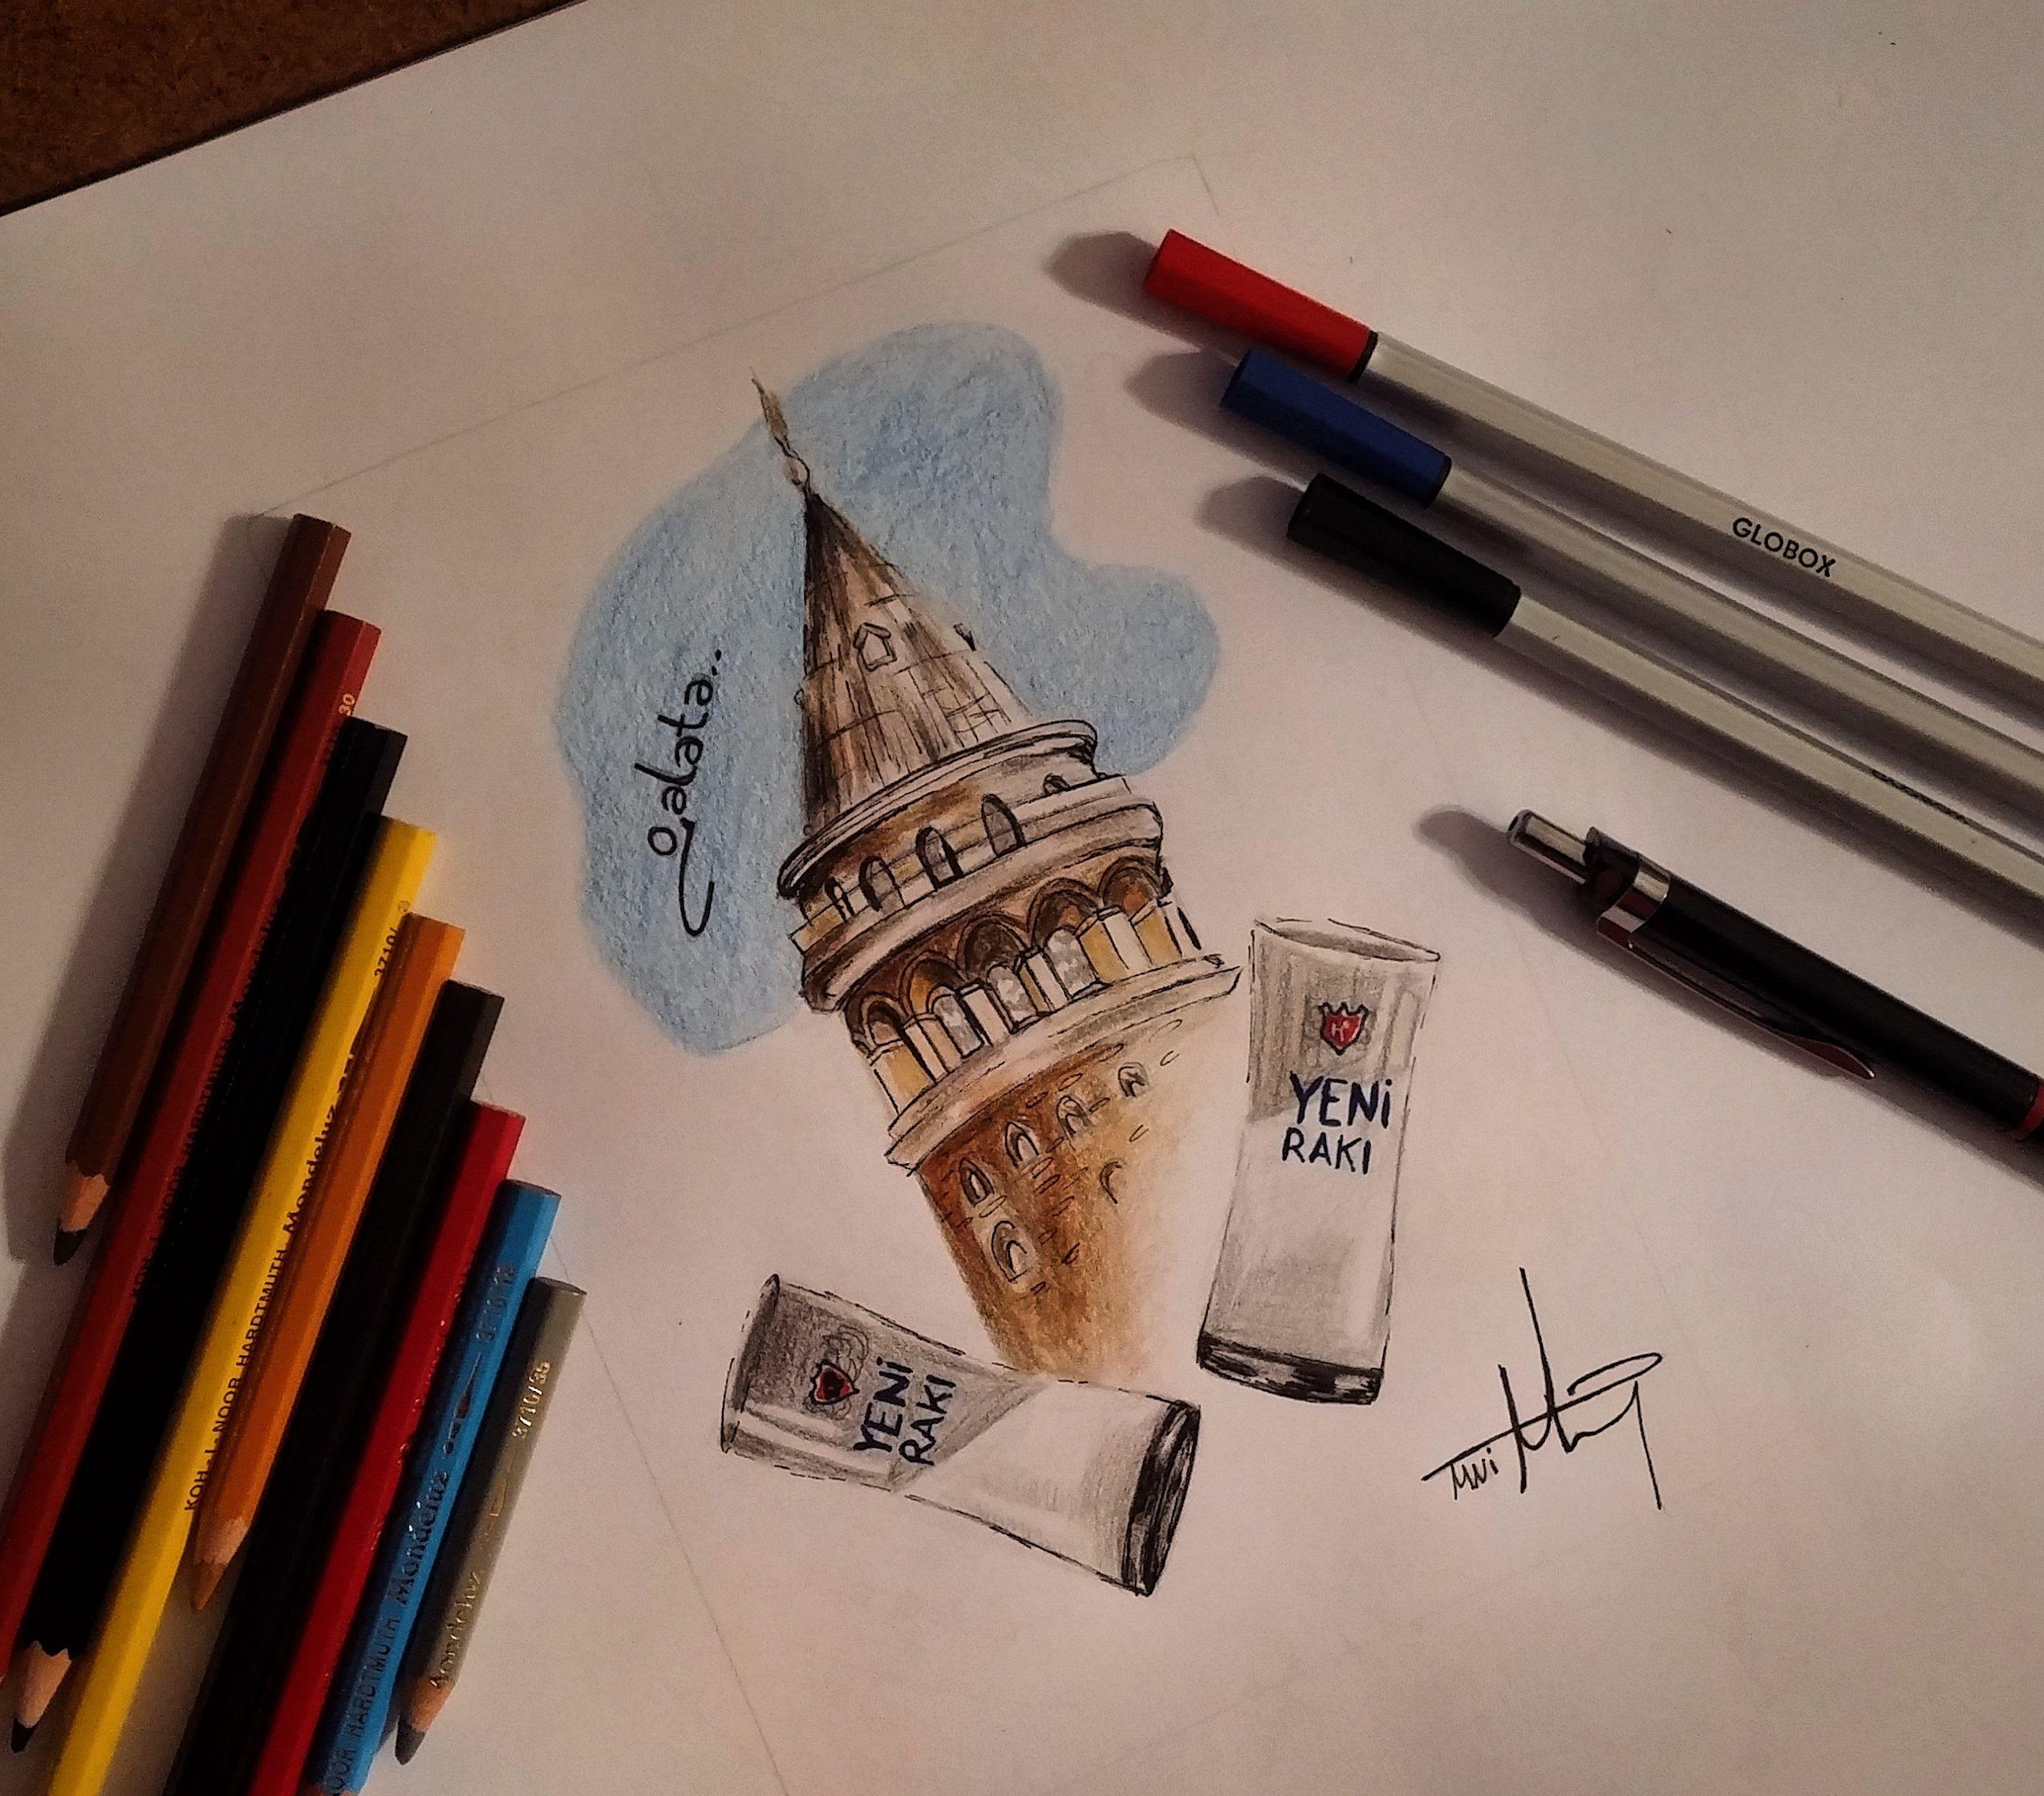 Art Artist Tors Pin Pinteres Artingo Clour Miraynuripekel